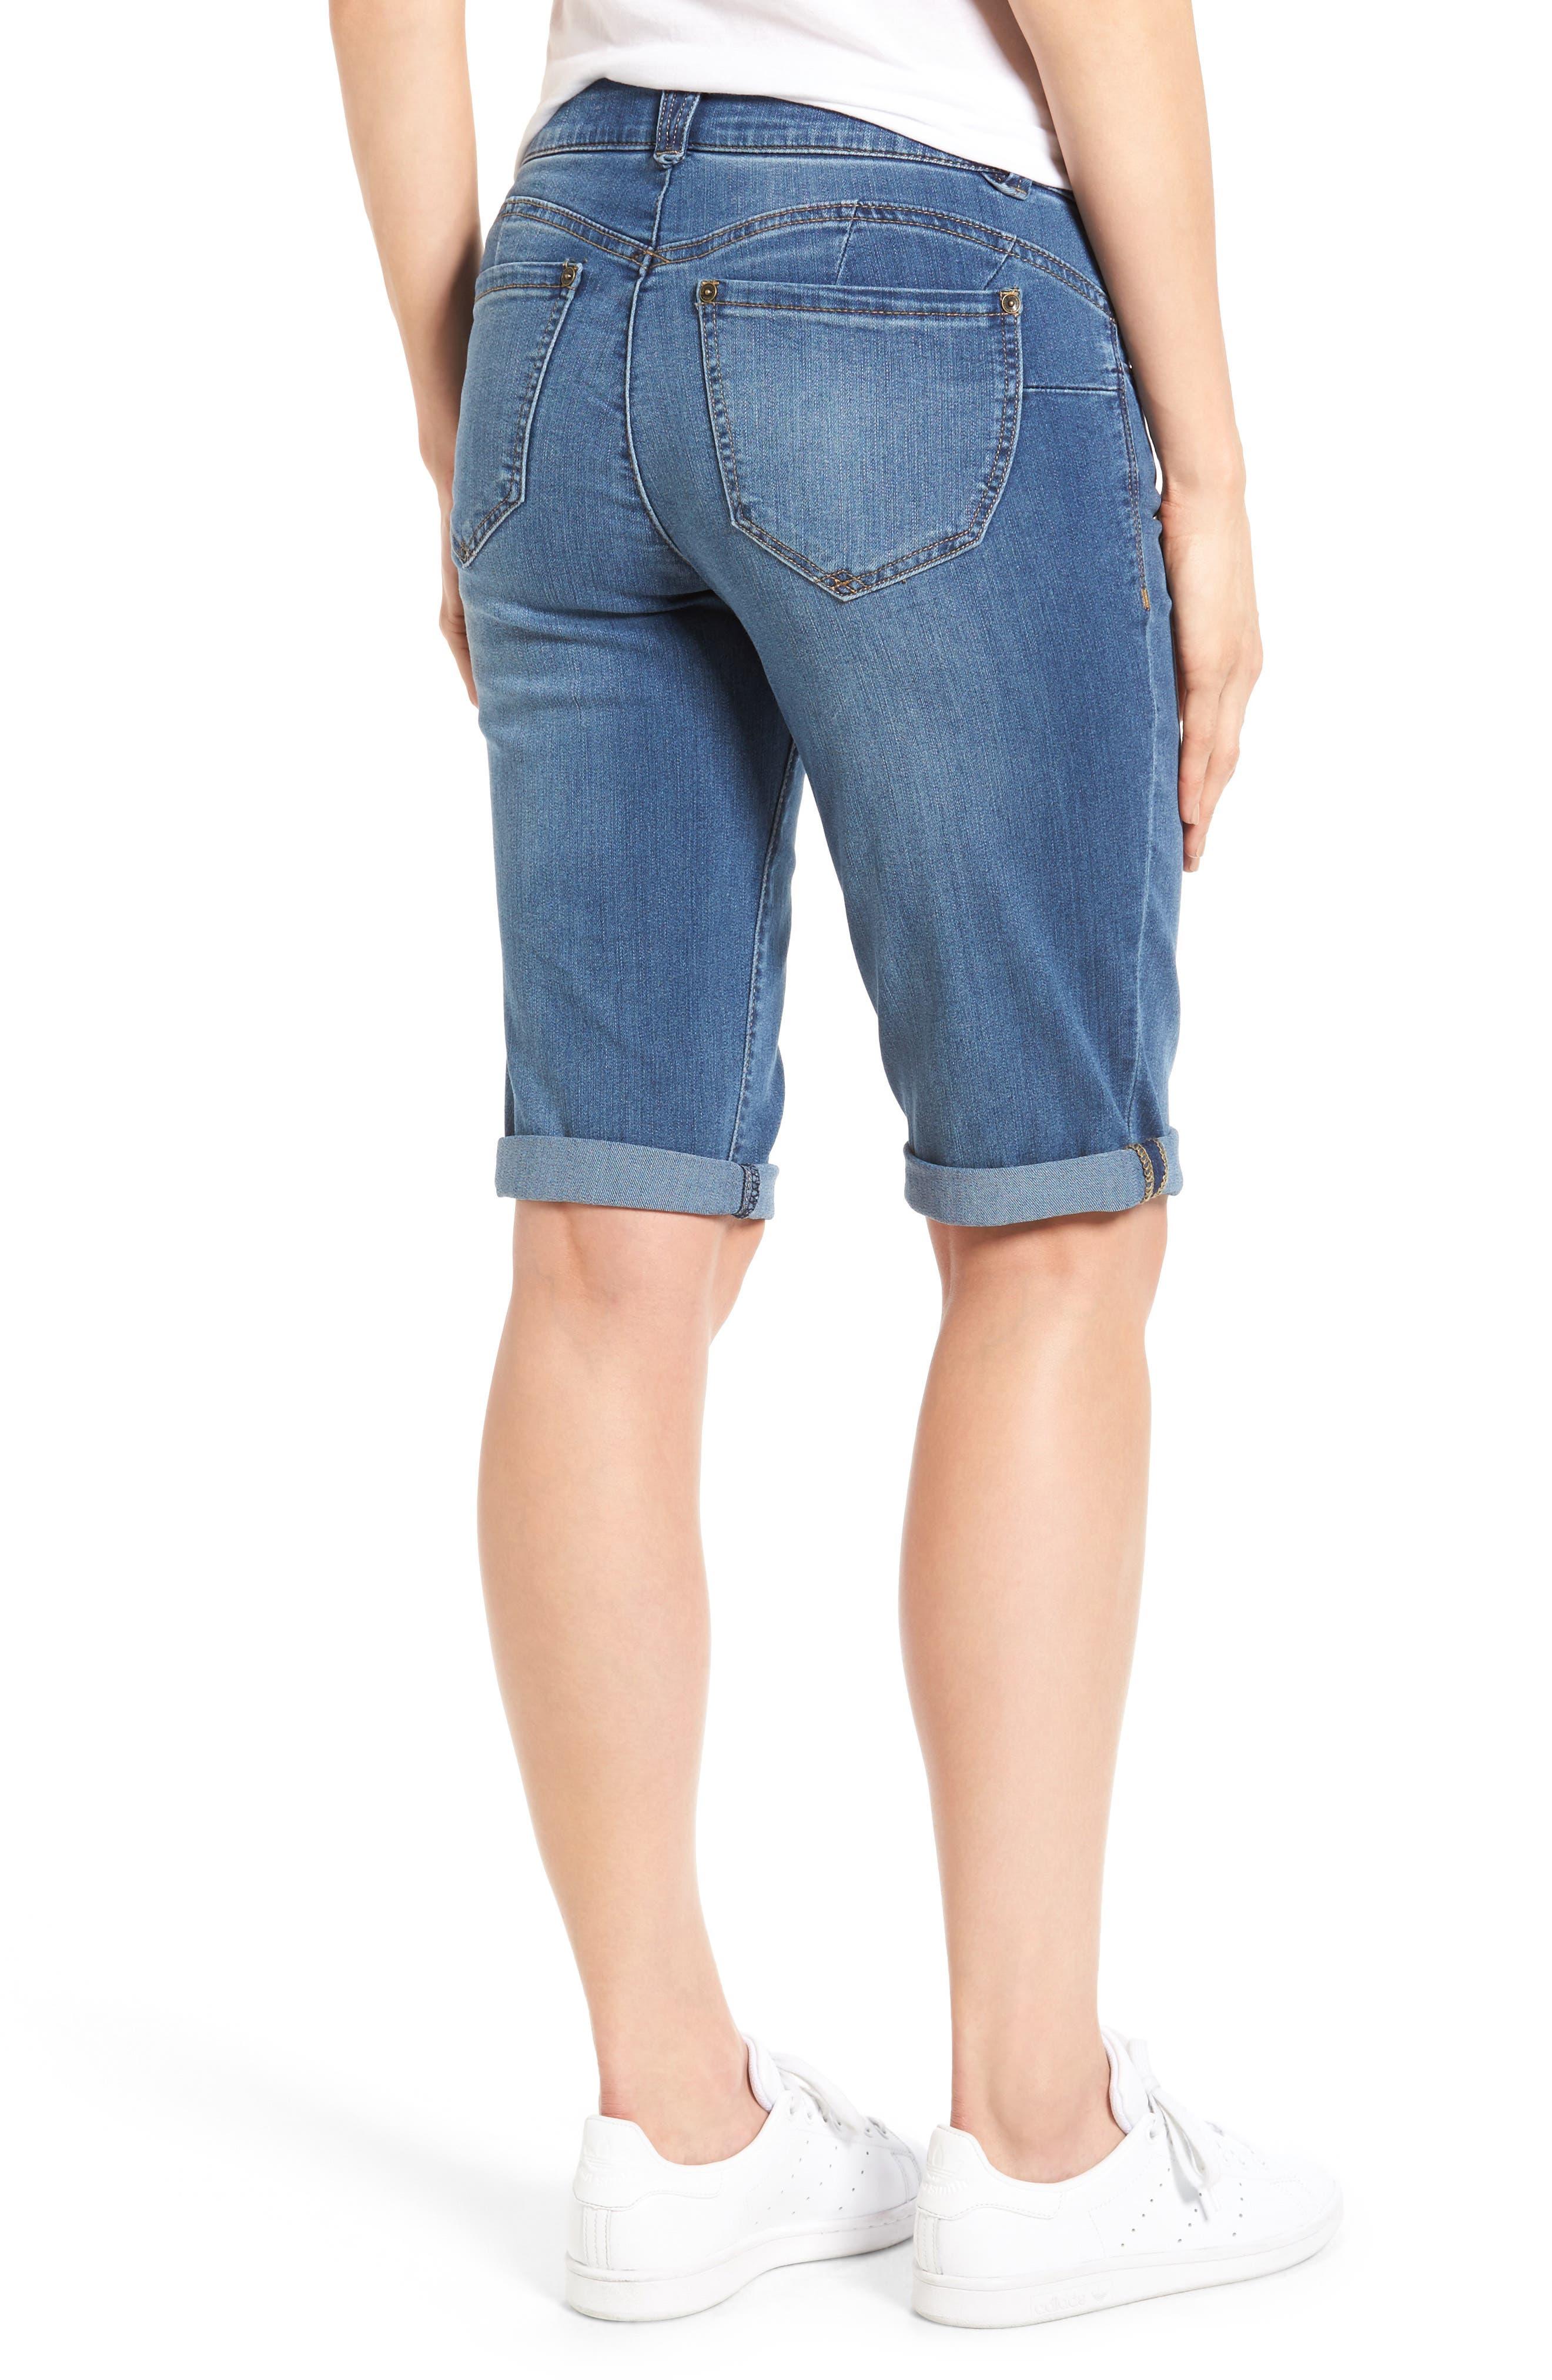 Alternate Image 3  - Wit & Wisdom Ab Solution Denim Bermuda Shorts (Nordstrom Exclusive)